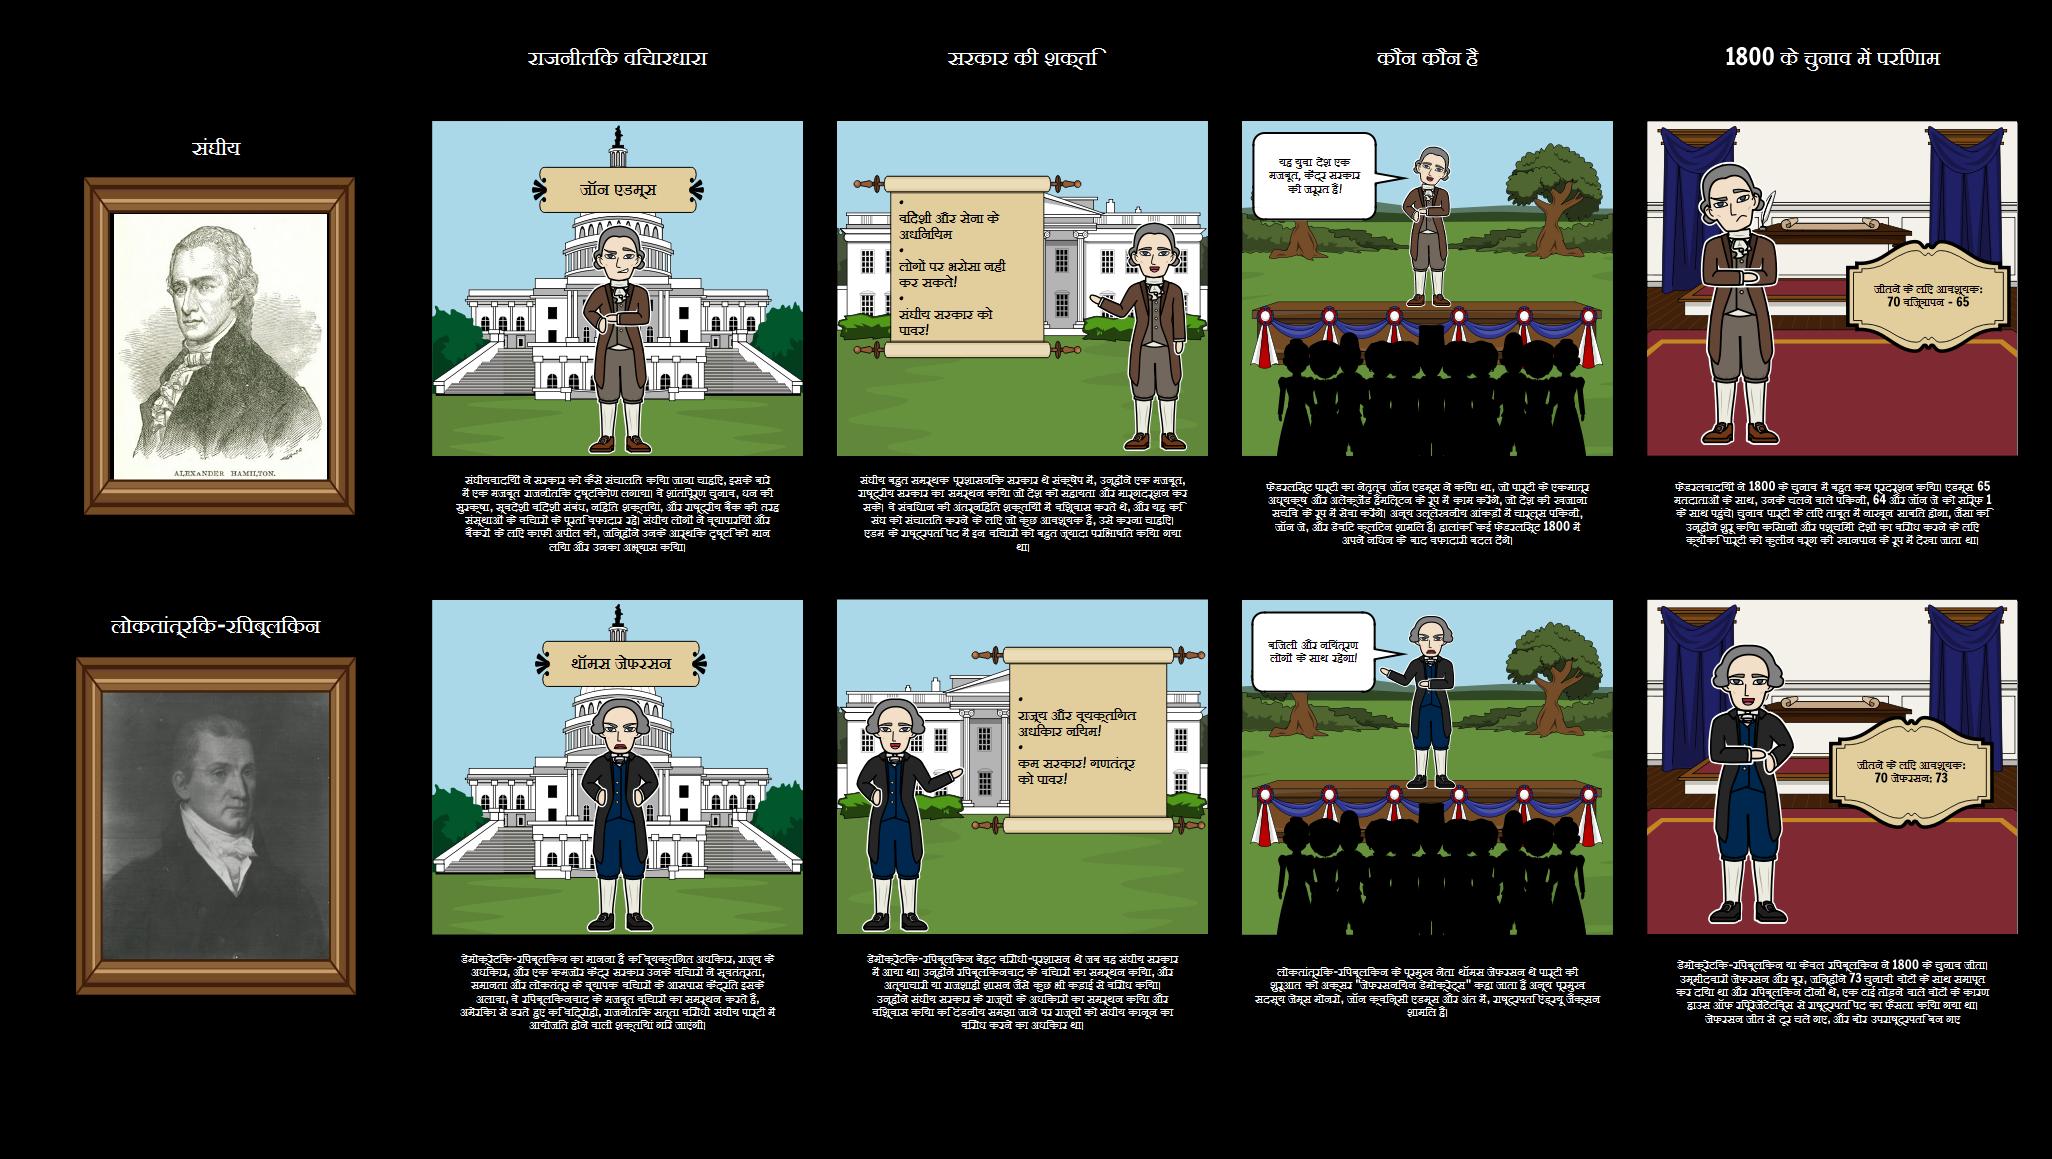 1800 के चुनाव - Federalists बनाम डेमोक्रेटिक रिपब्लिकन